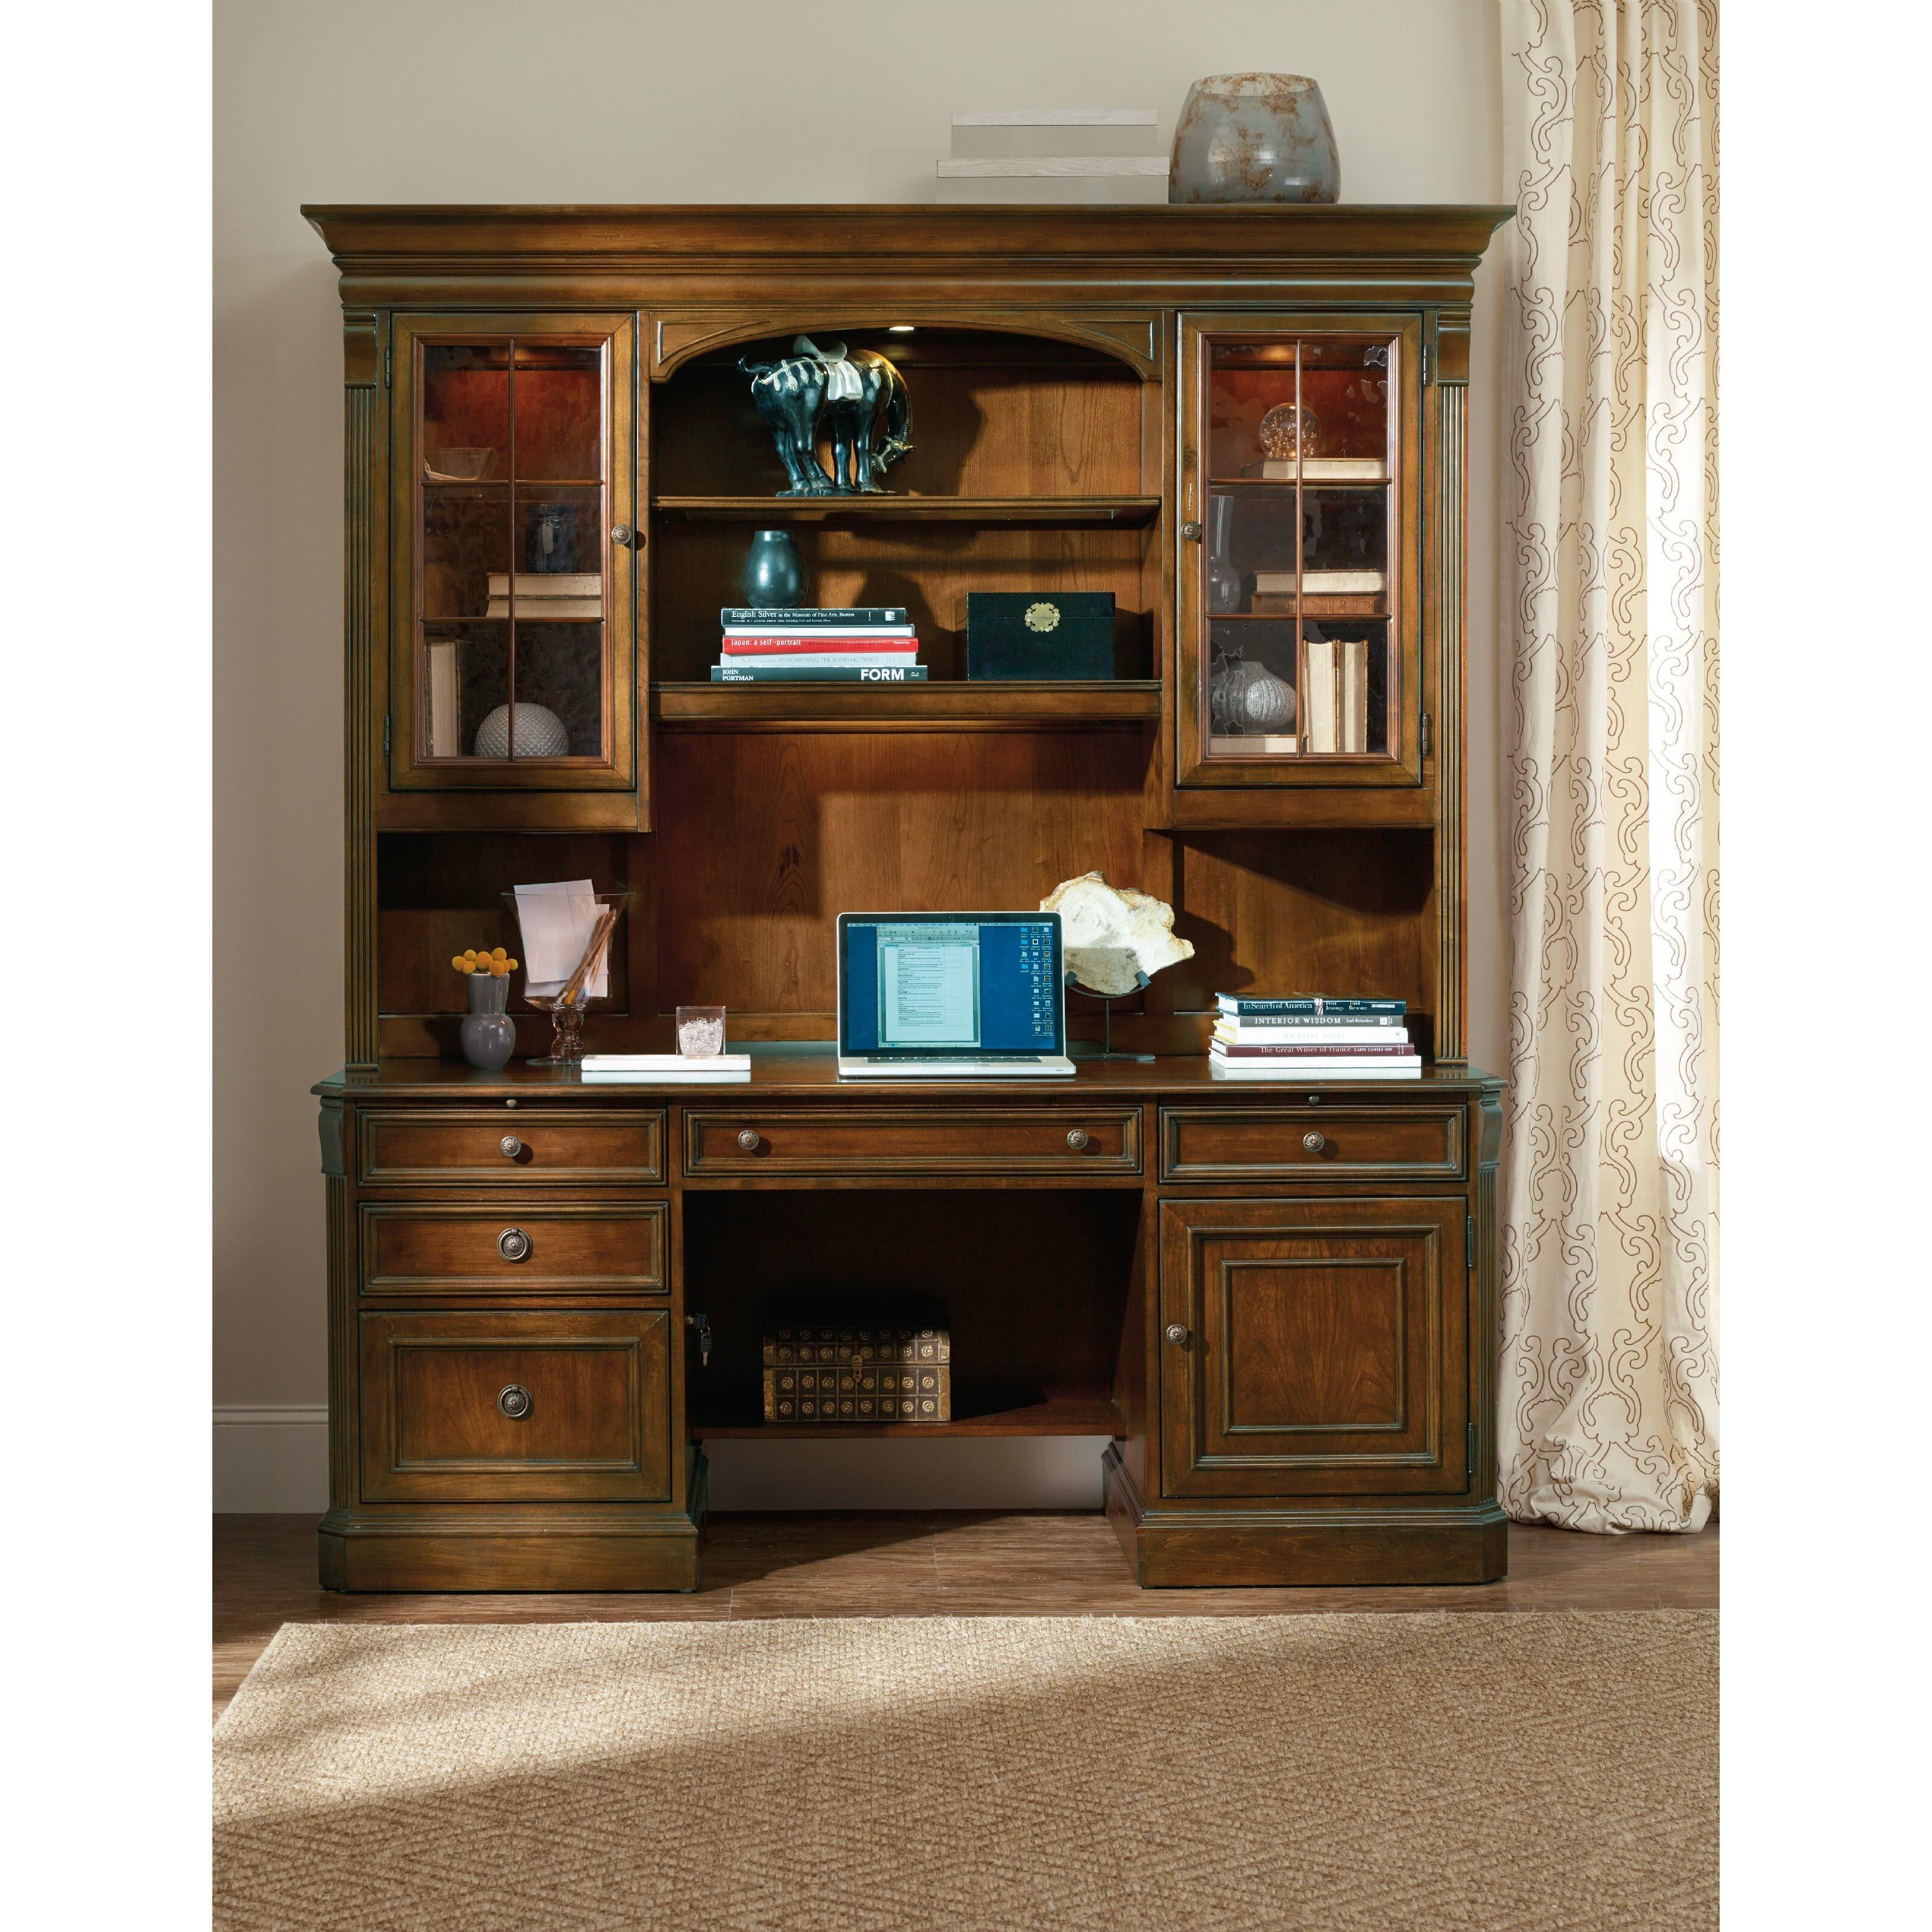 Hooker Furniture Brookhaven Armoire Desk Reviews: Hooker Furniture Brookhaven Credenza Desk